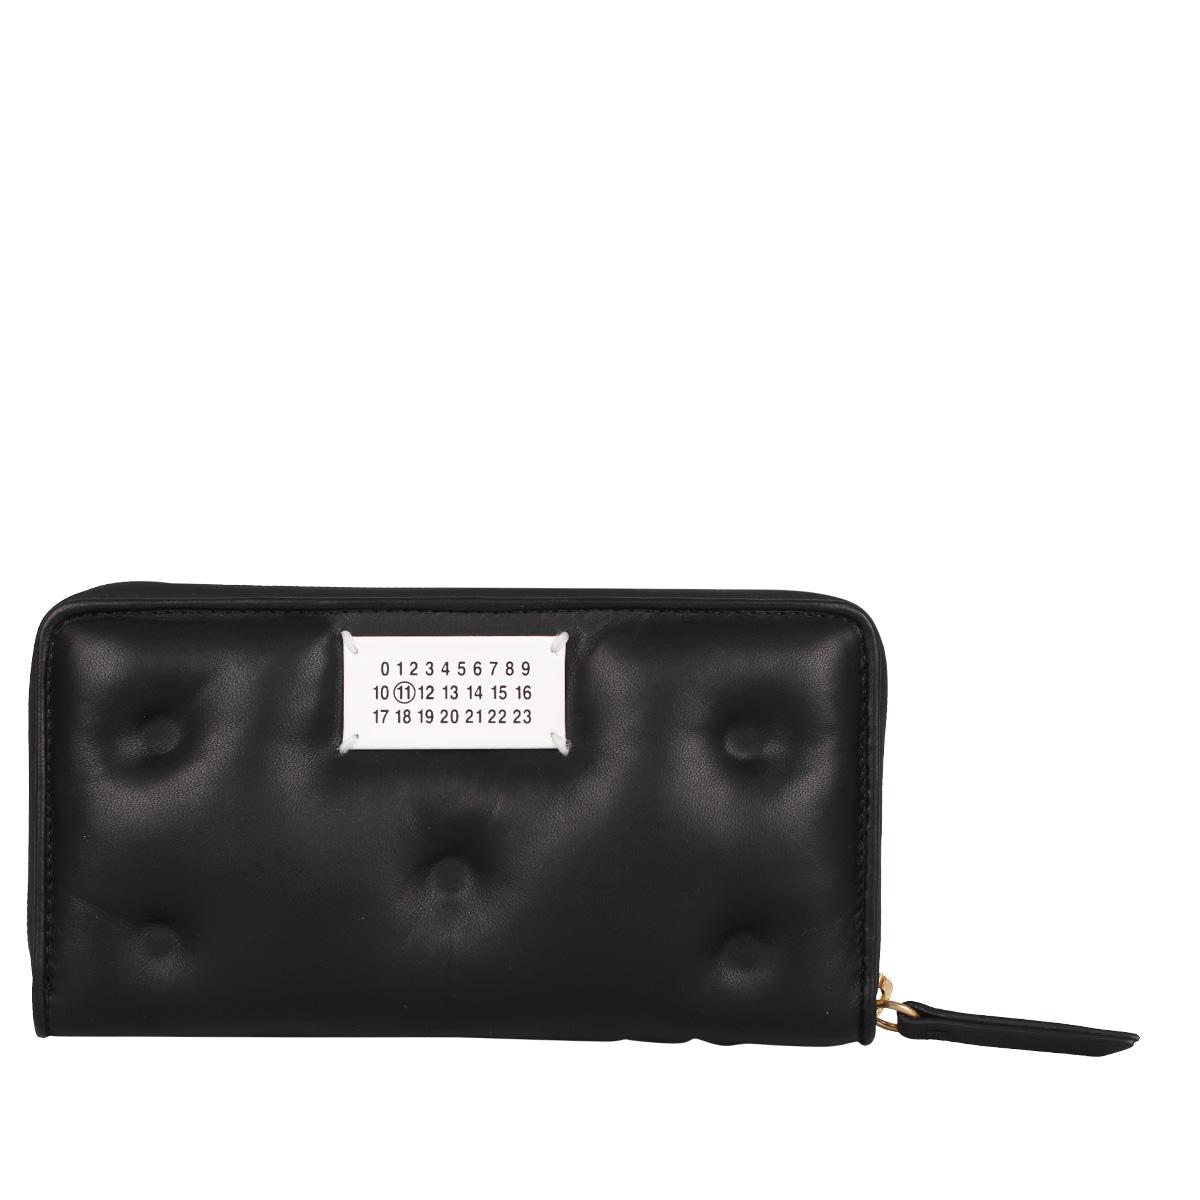 MAISON MARGIELA LONG WALLET メゾンマルジェラ 財布 長財布 メンズ レディース ラウンドファスナー ブラック 黒 S56UI0110 [4/15 新入荷]